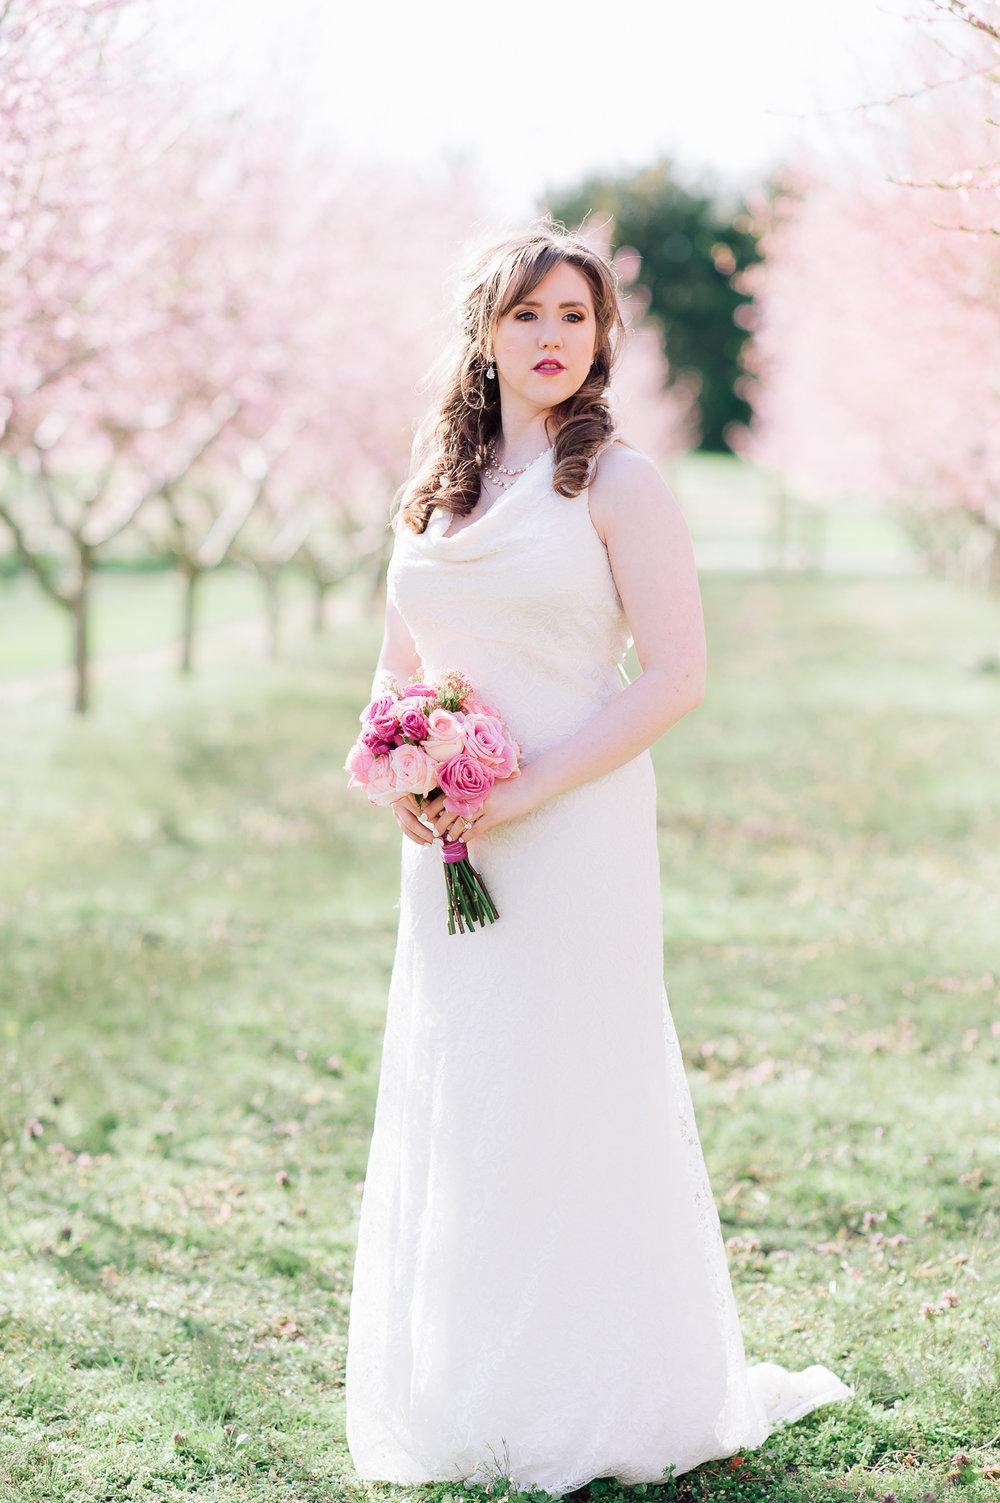 springwedding_cherryblossoms_virginiaphotographer_youseephotography_styledshoot (511).jpg